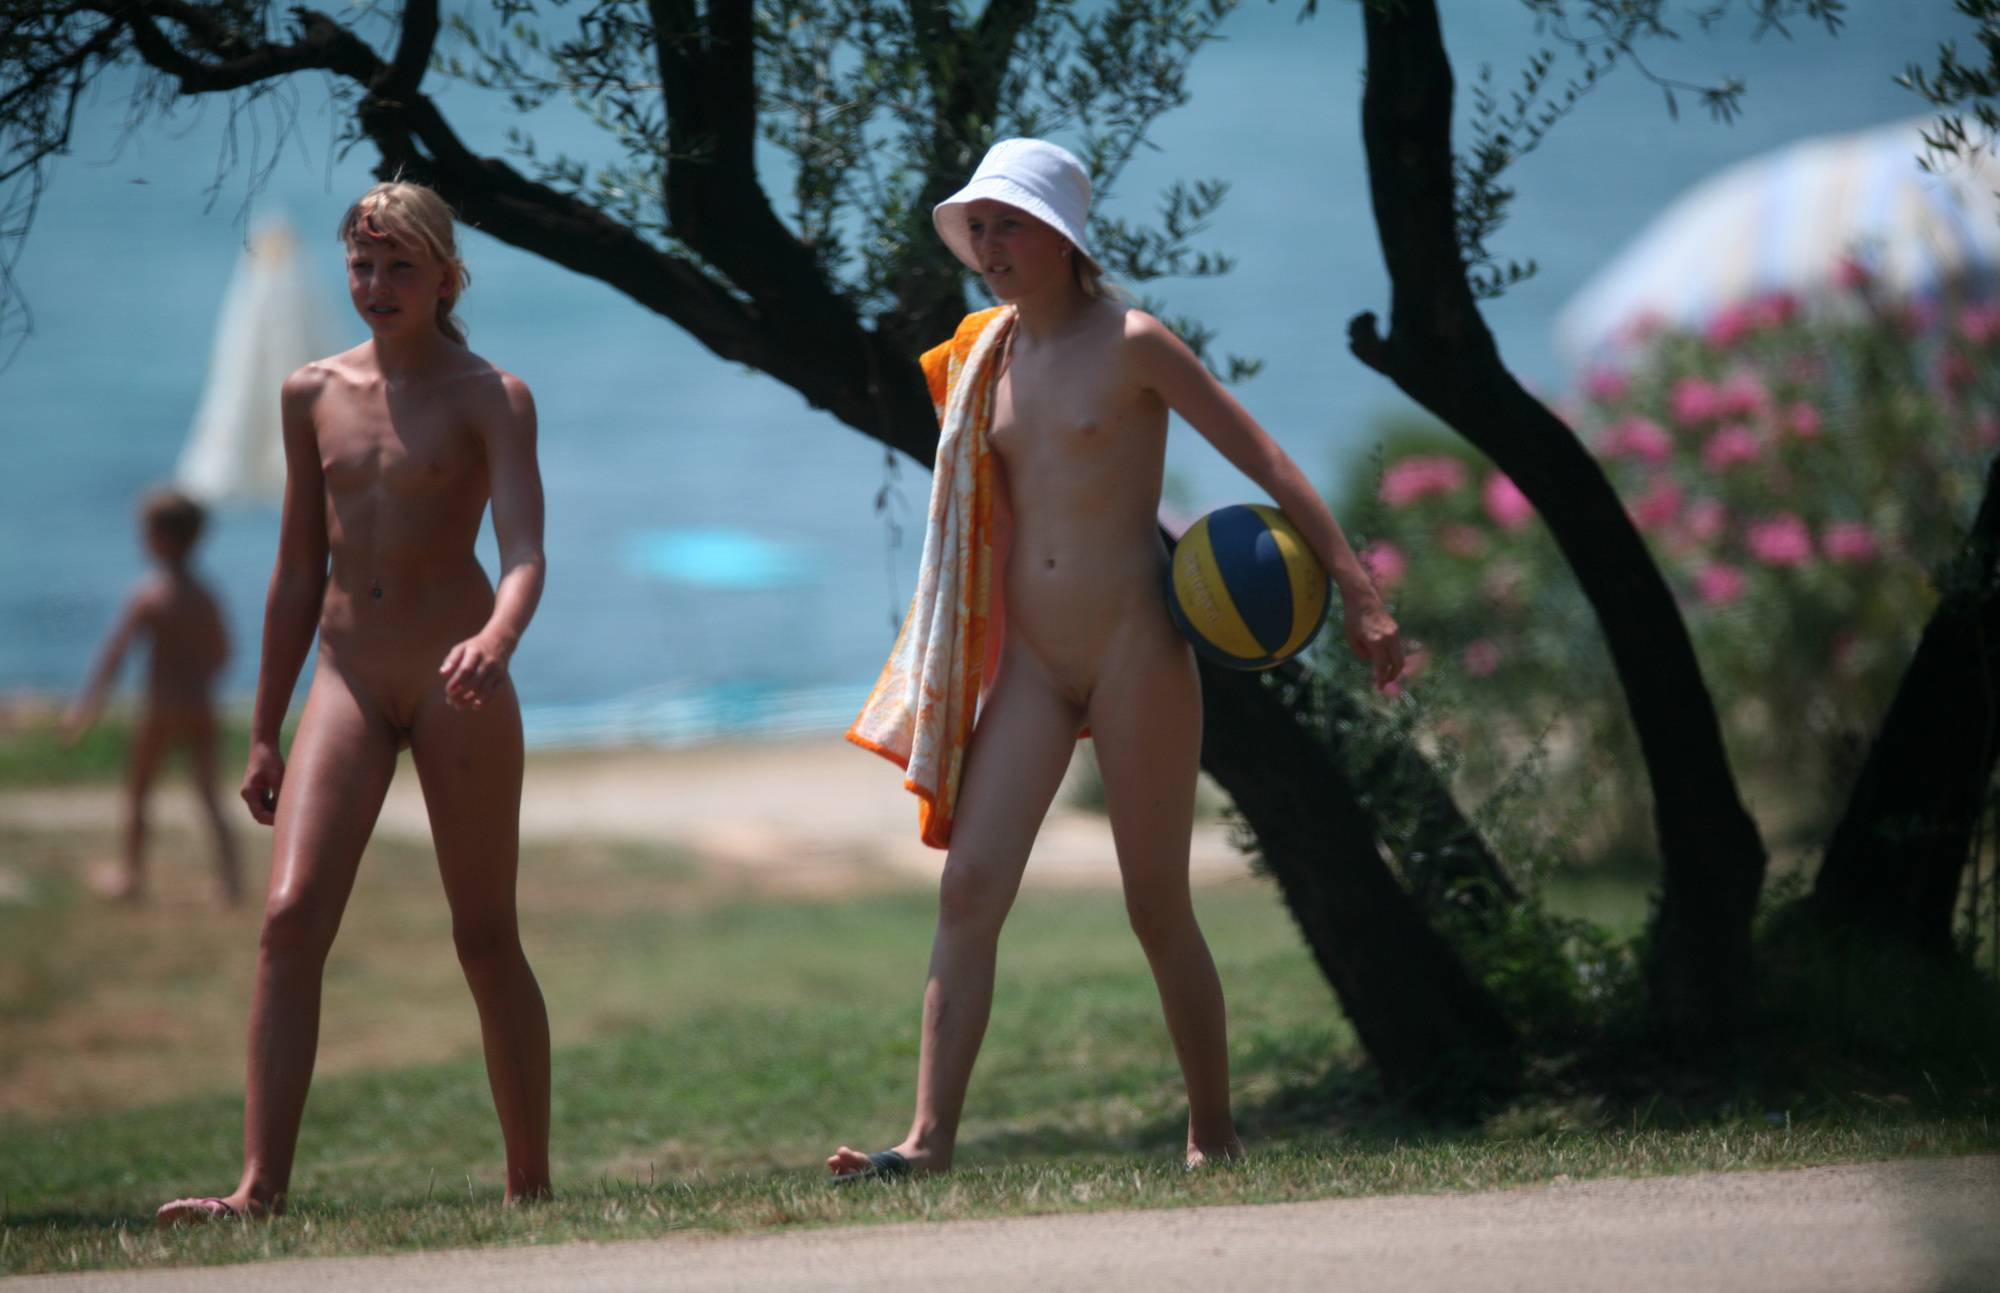 Nudist Photos Two Nudist Friends Walk - 2